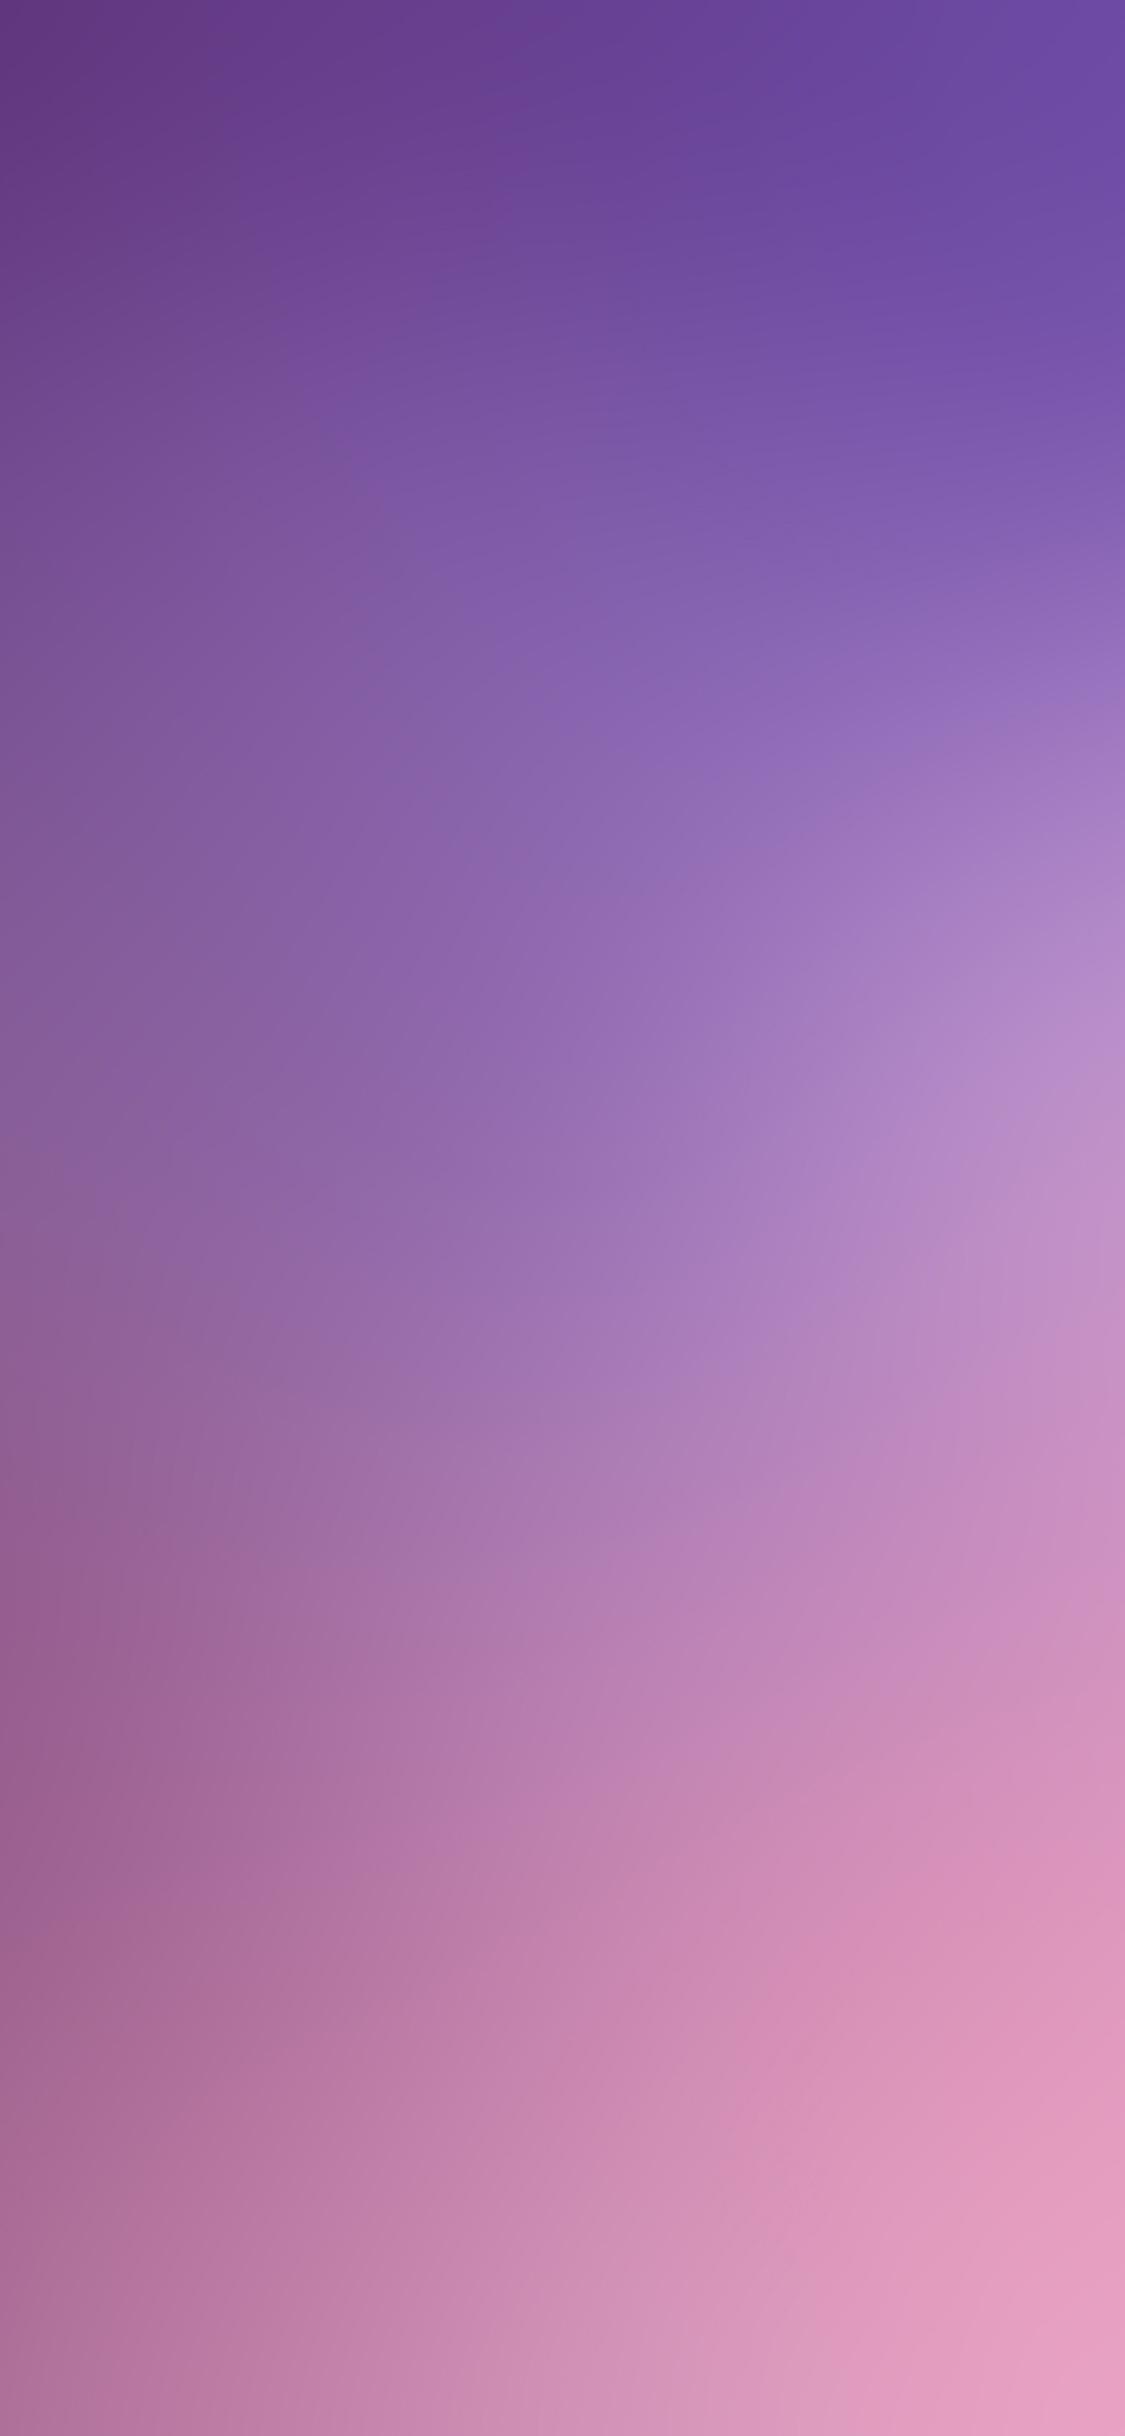 iPhoneXpapers.com-Apple-iPhone-wallpaper-sd66-pink-man-at-home-gradation-blur